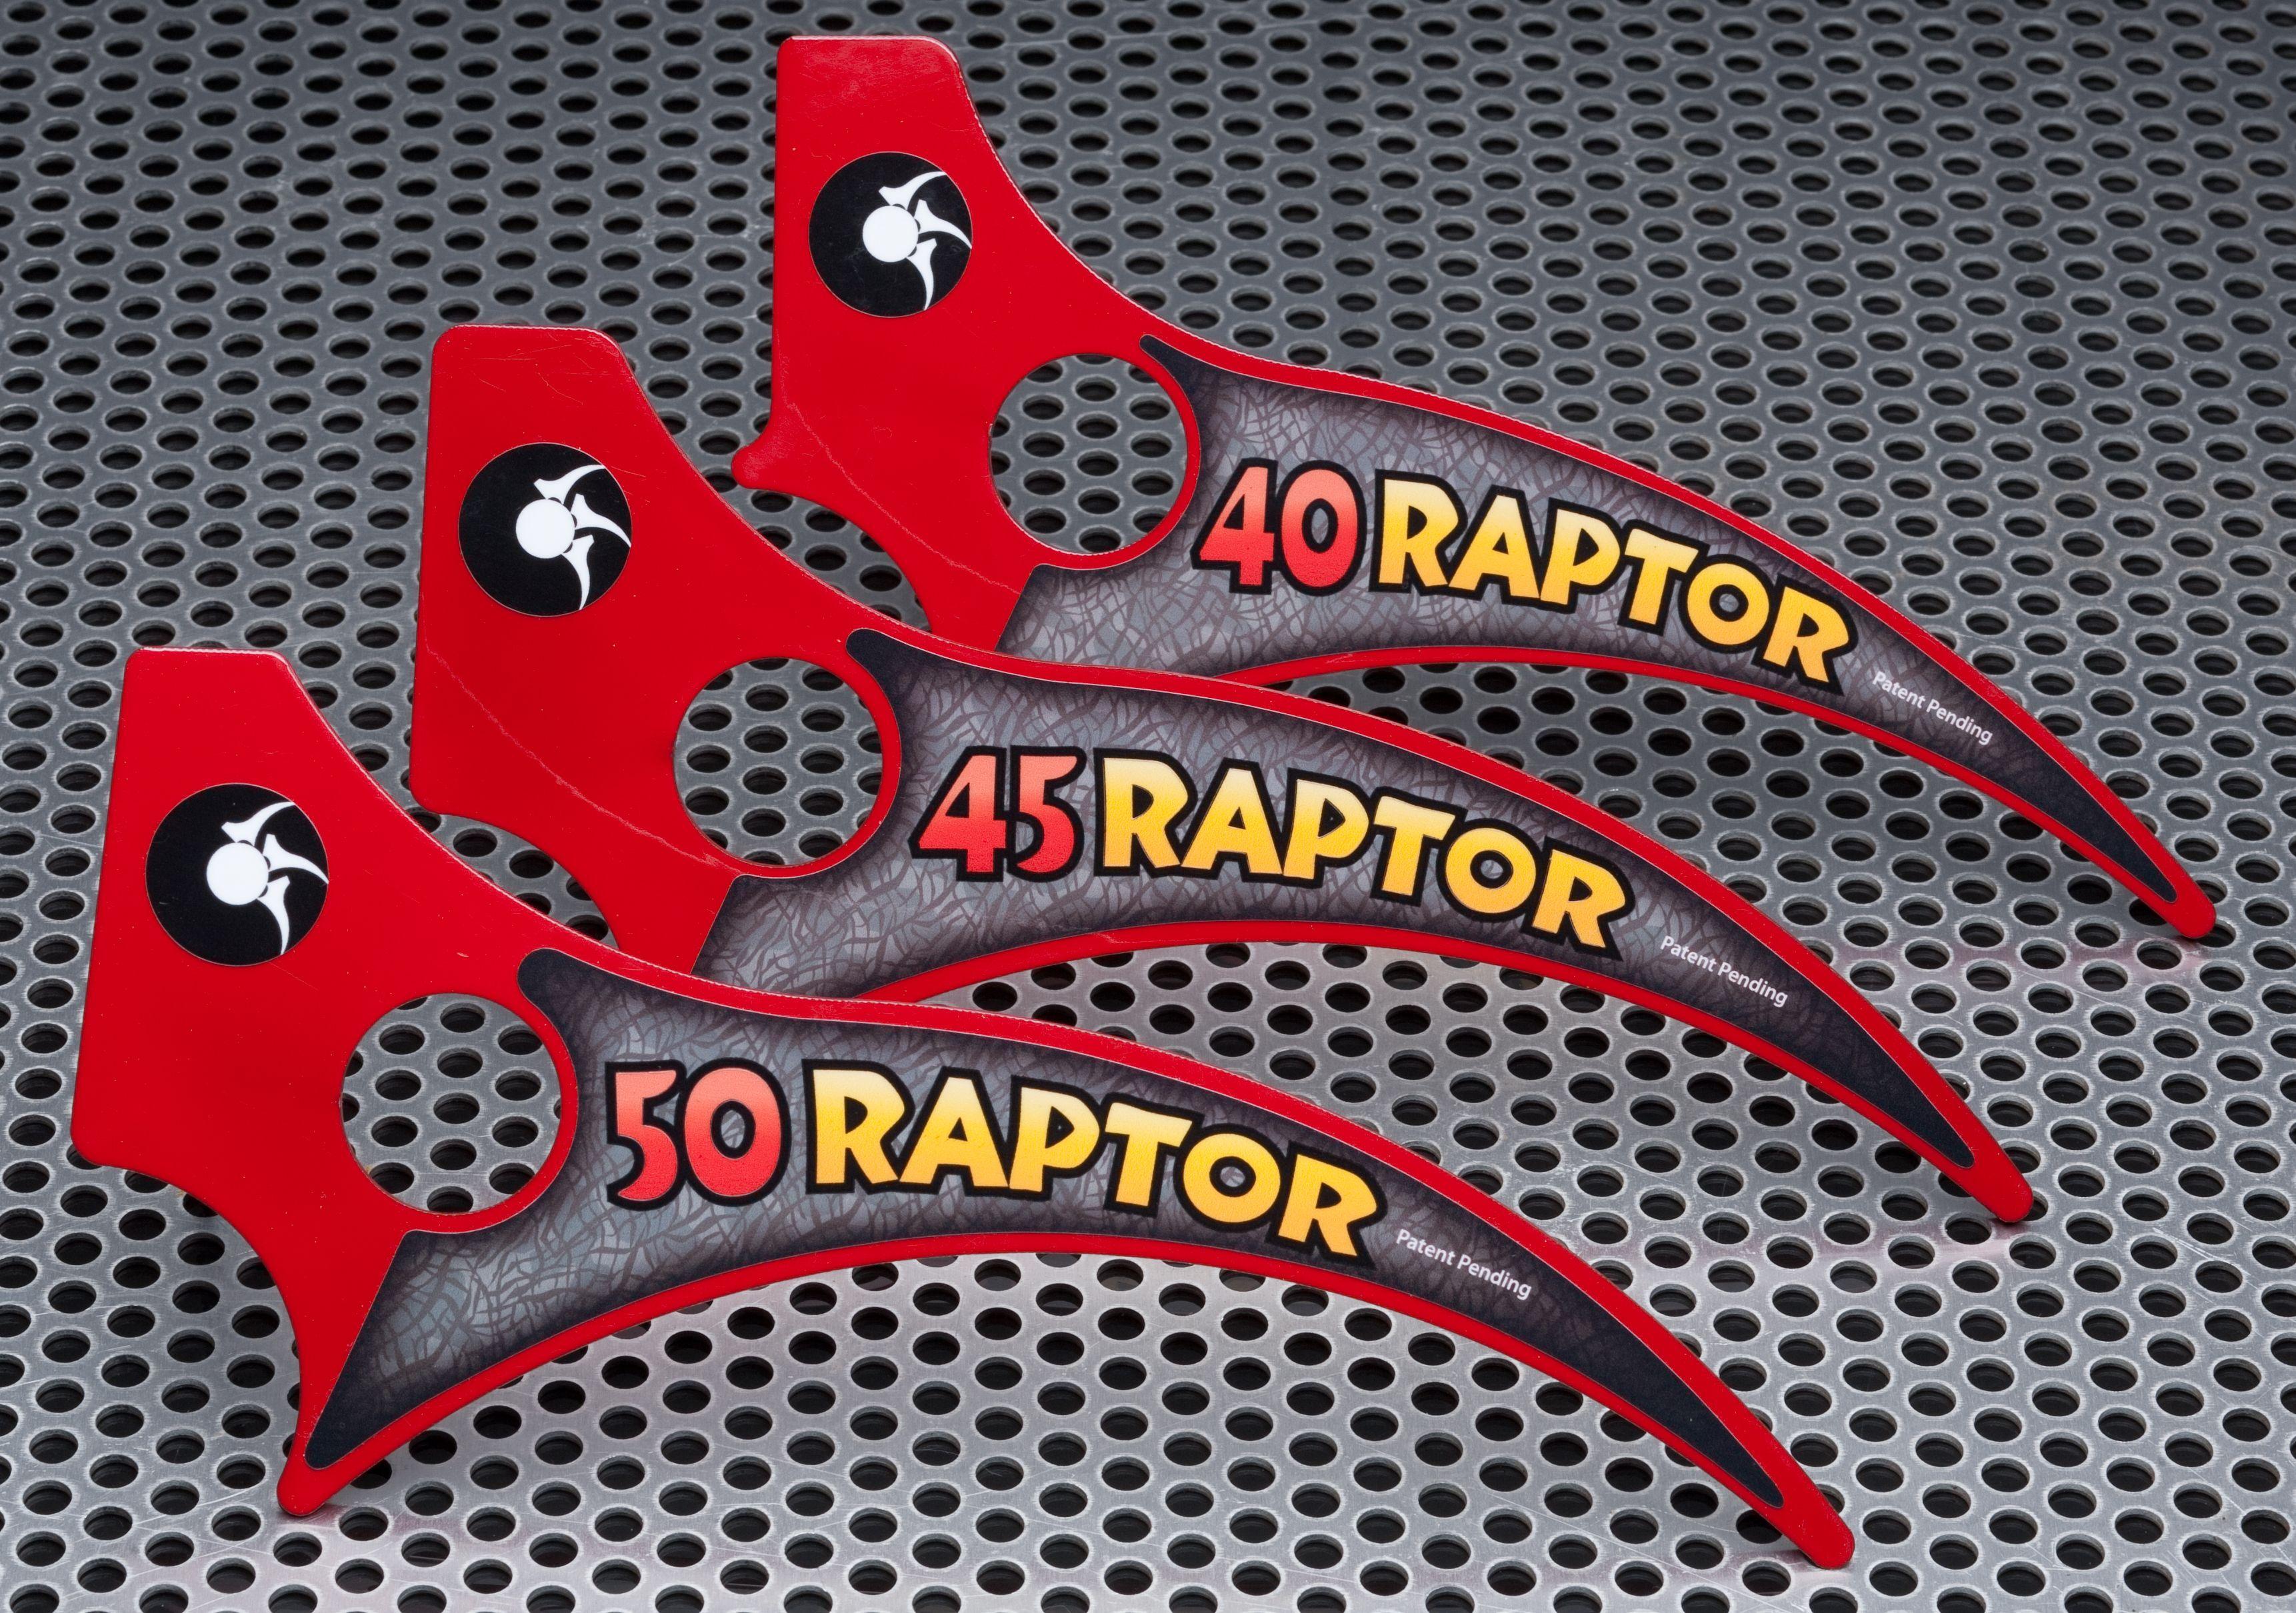 Raptor Set Up Tools | Woodturning Tools and Supplies | Craft